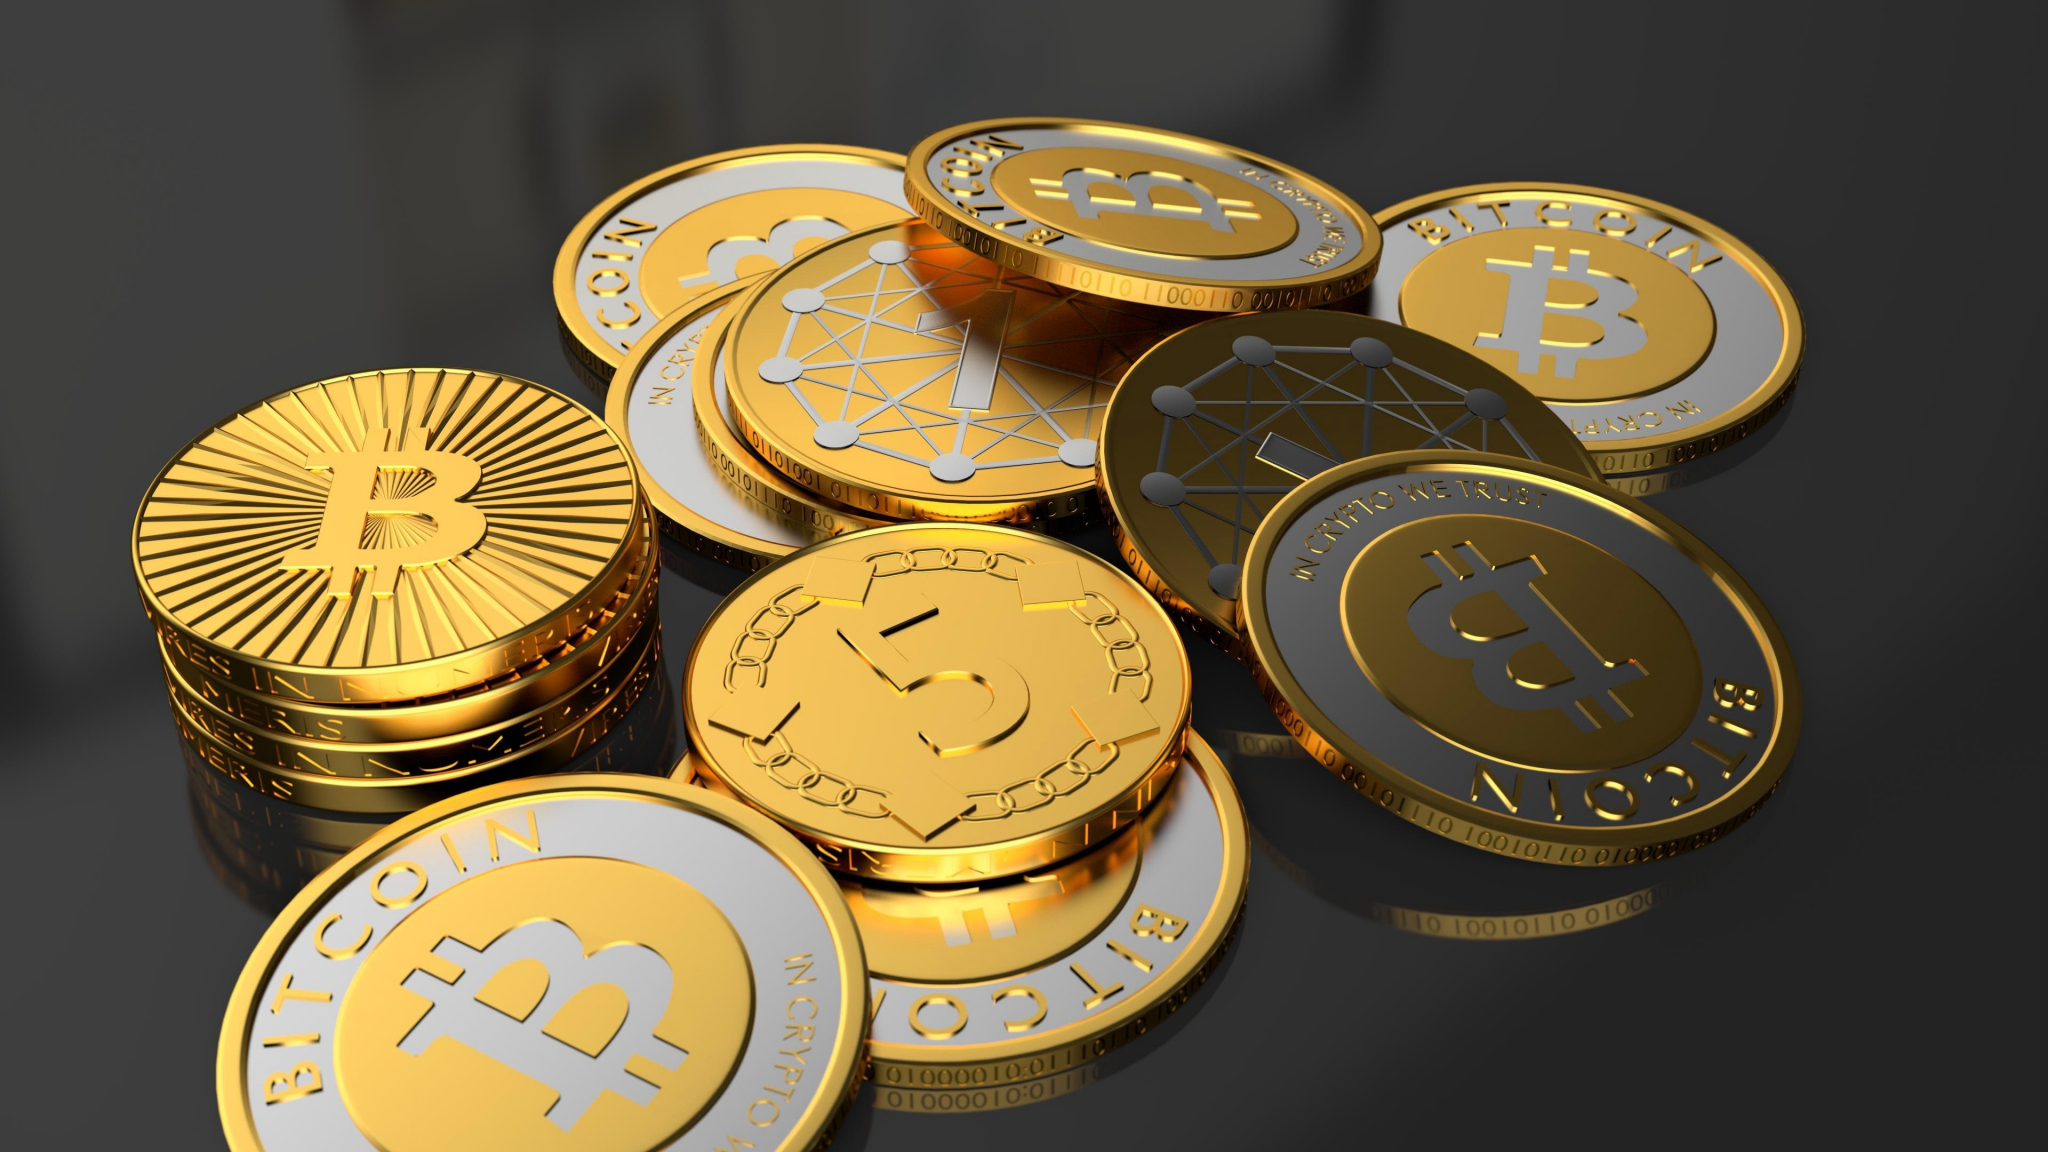 Download 2048x1152 Wallpaper Coins, Bitcoin, 4k, Dual Wide,